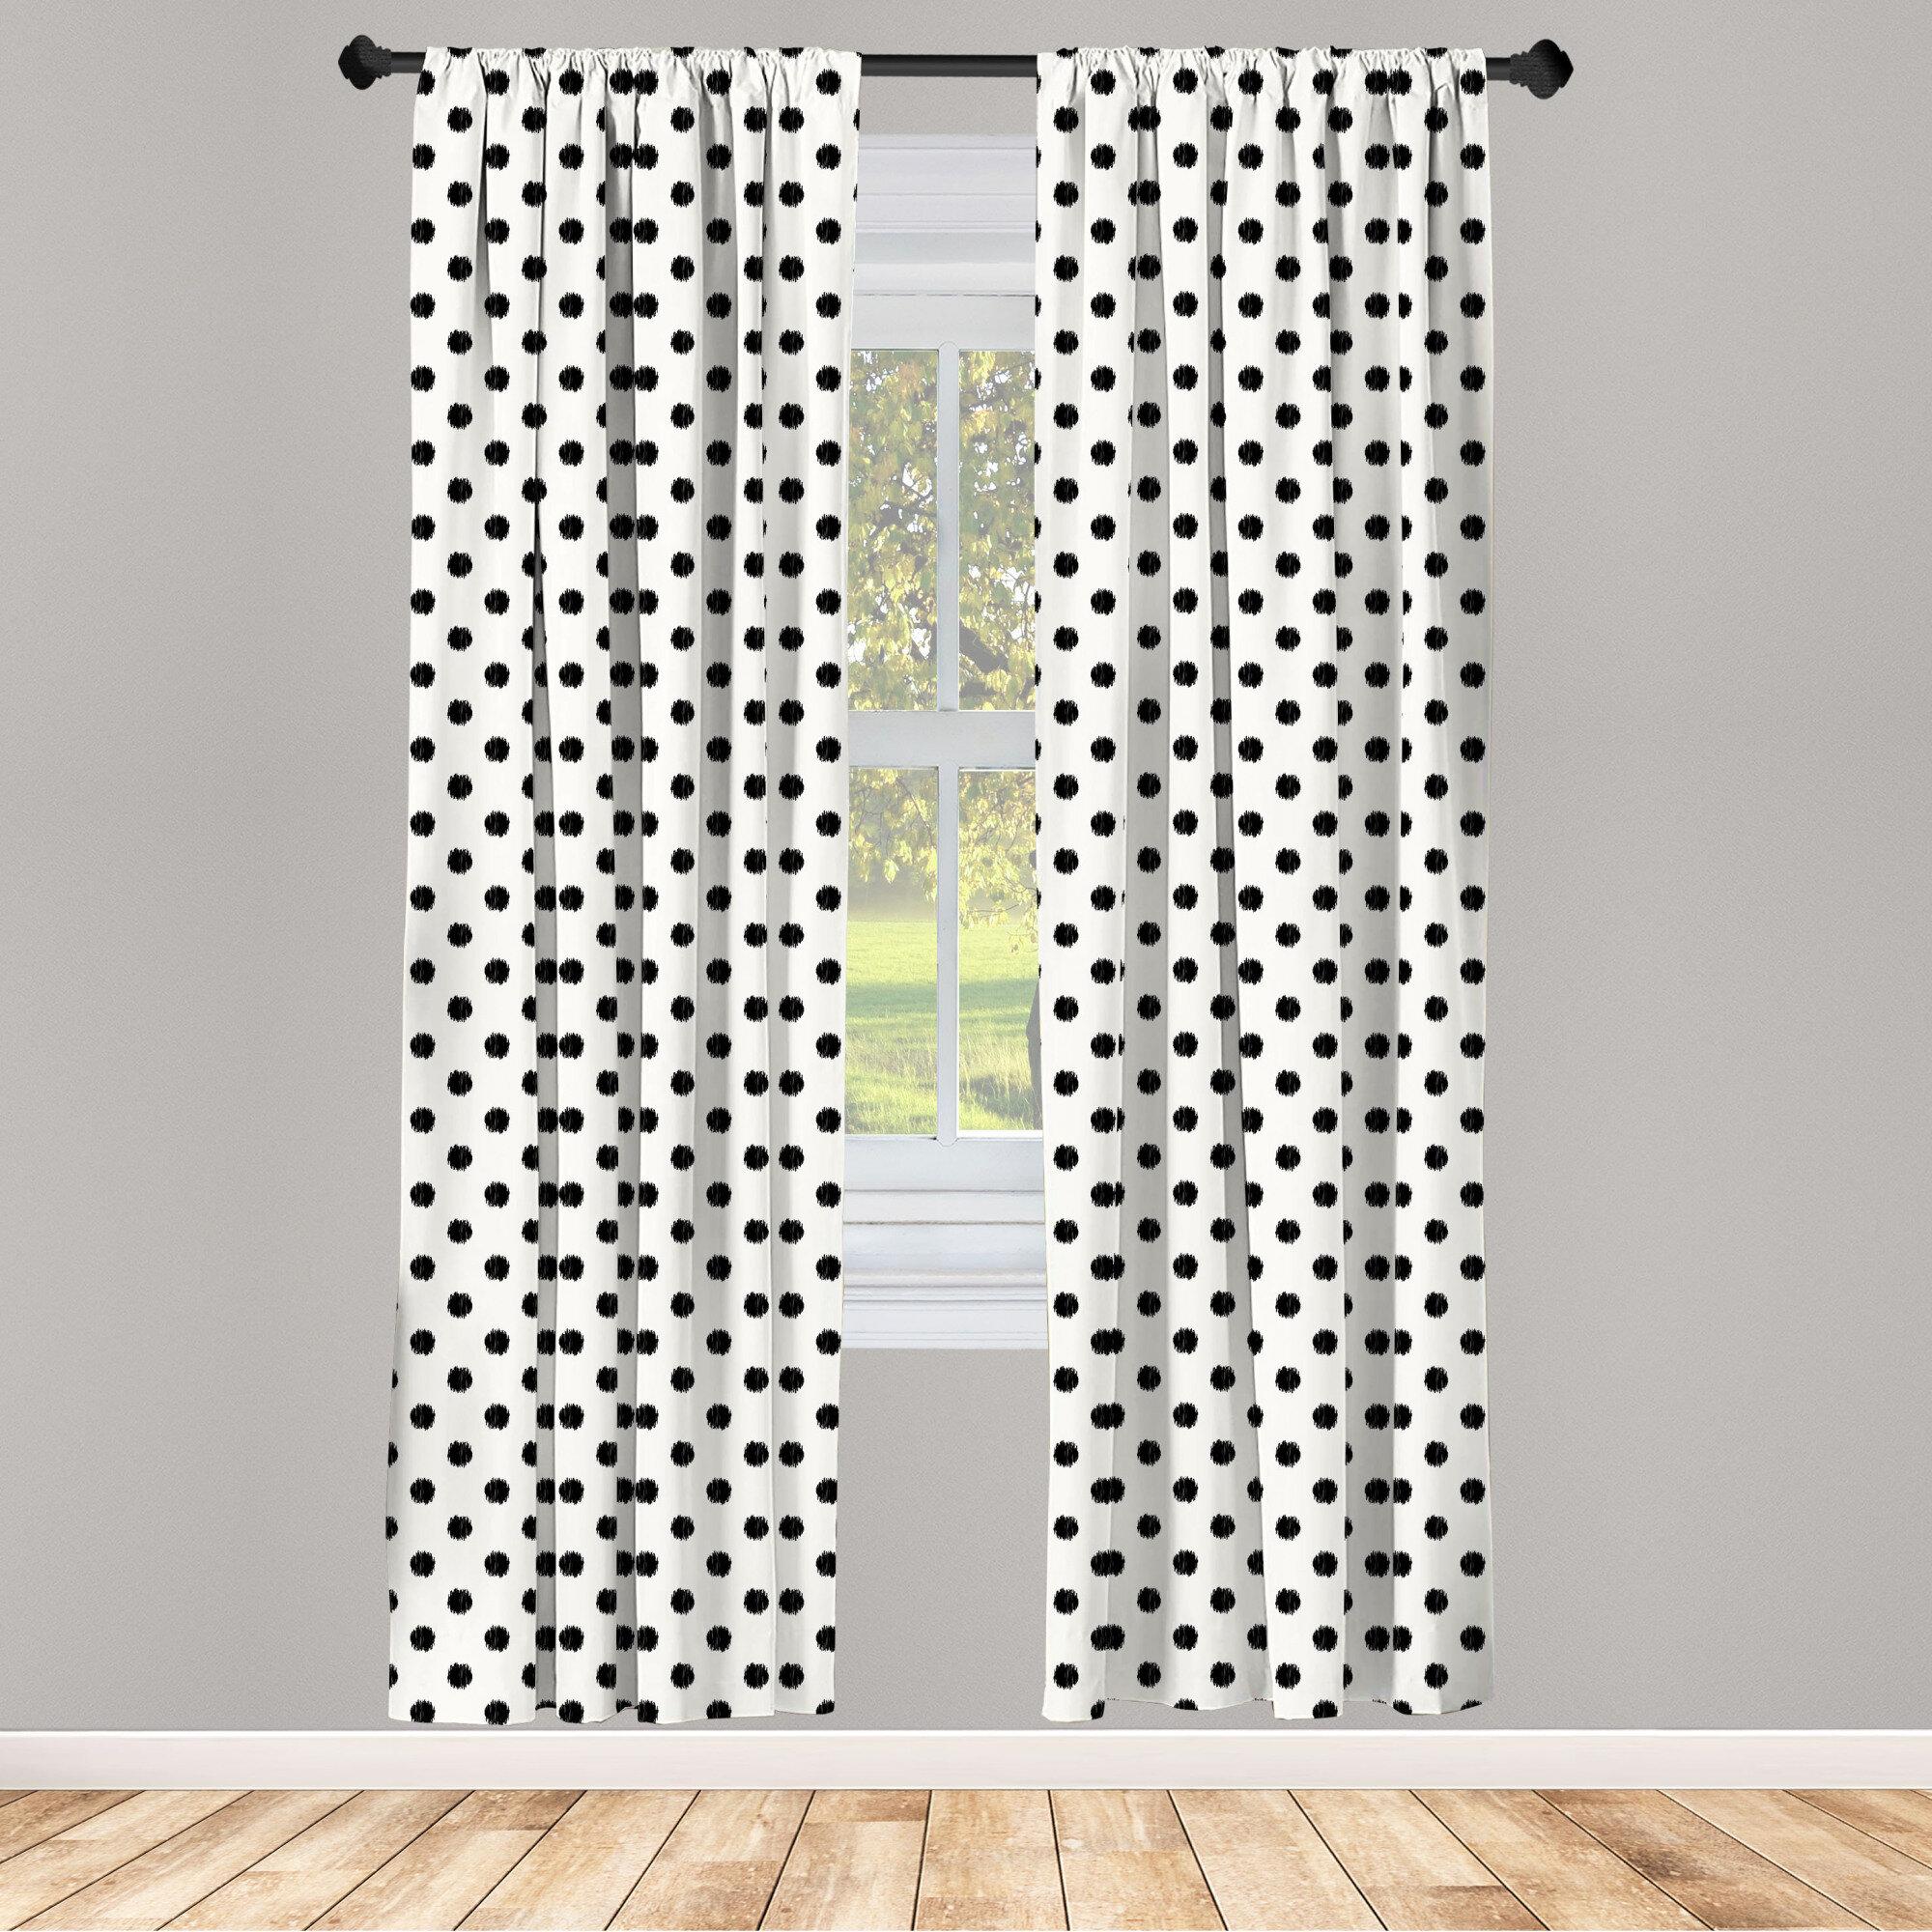 East Urban Home Bogata Polka Dots Room Darkening Rod Pocket Curtain Panels Reviews Wayfair